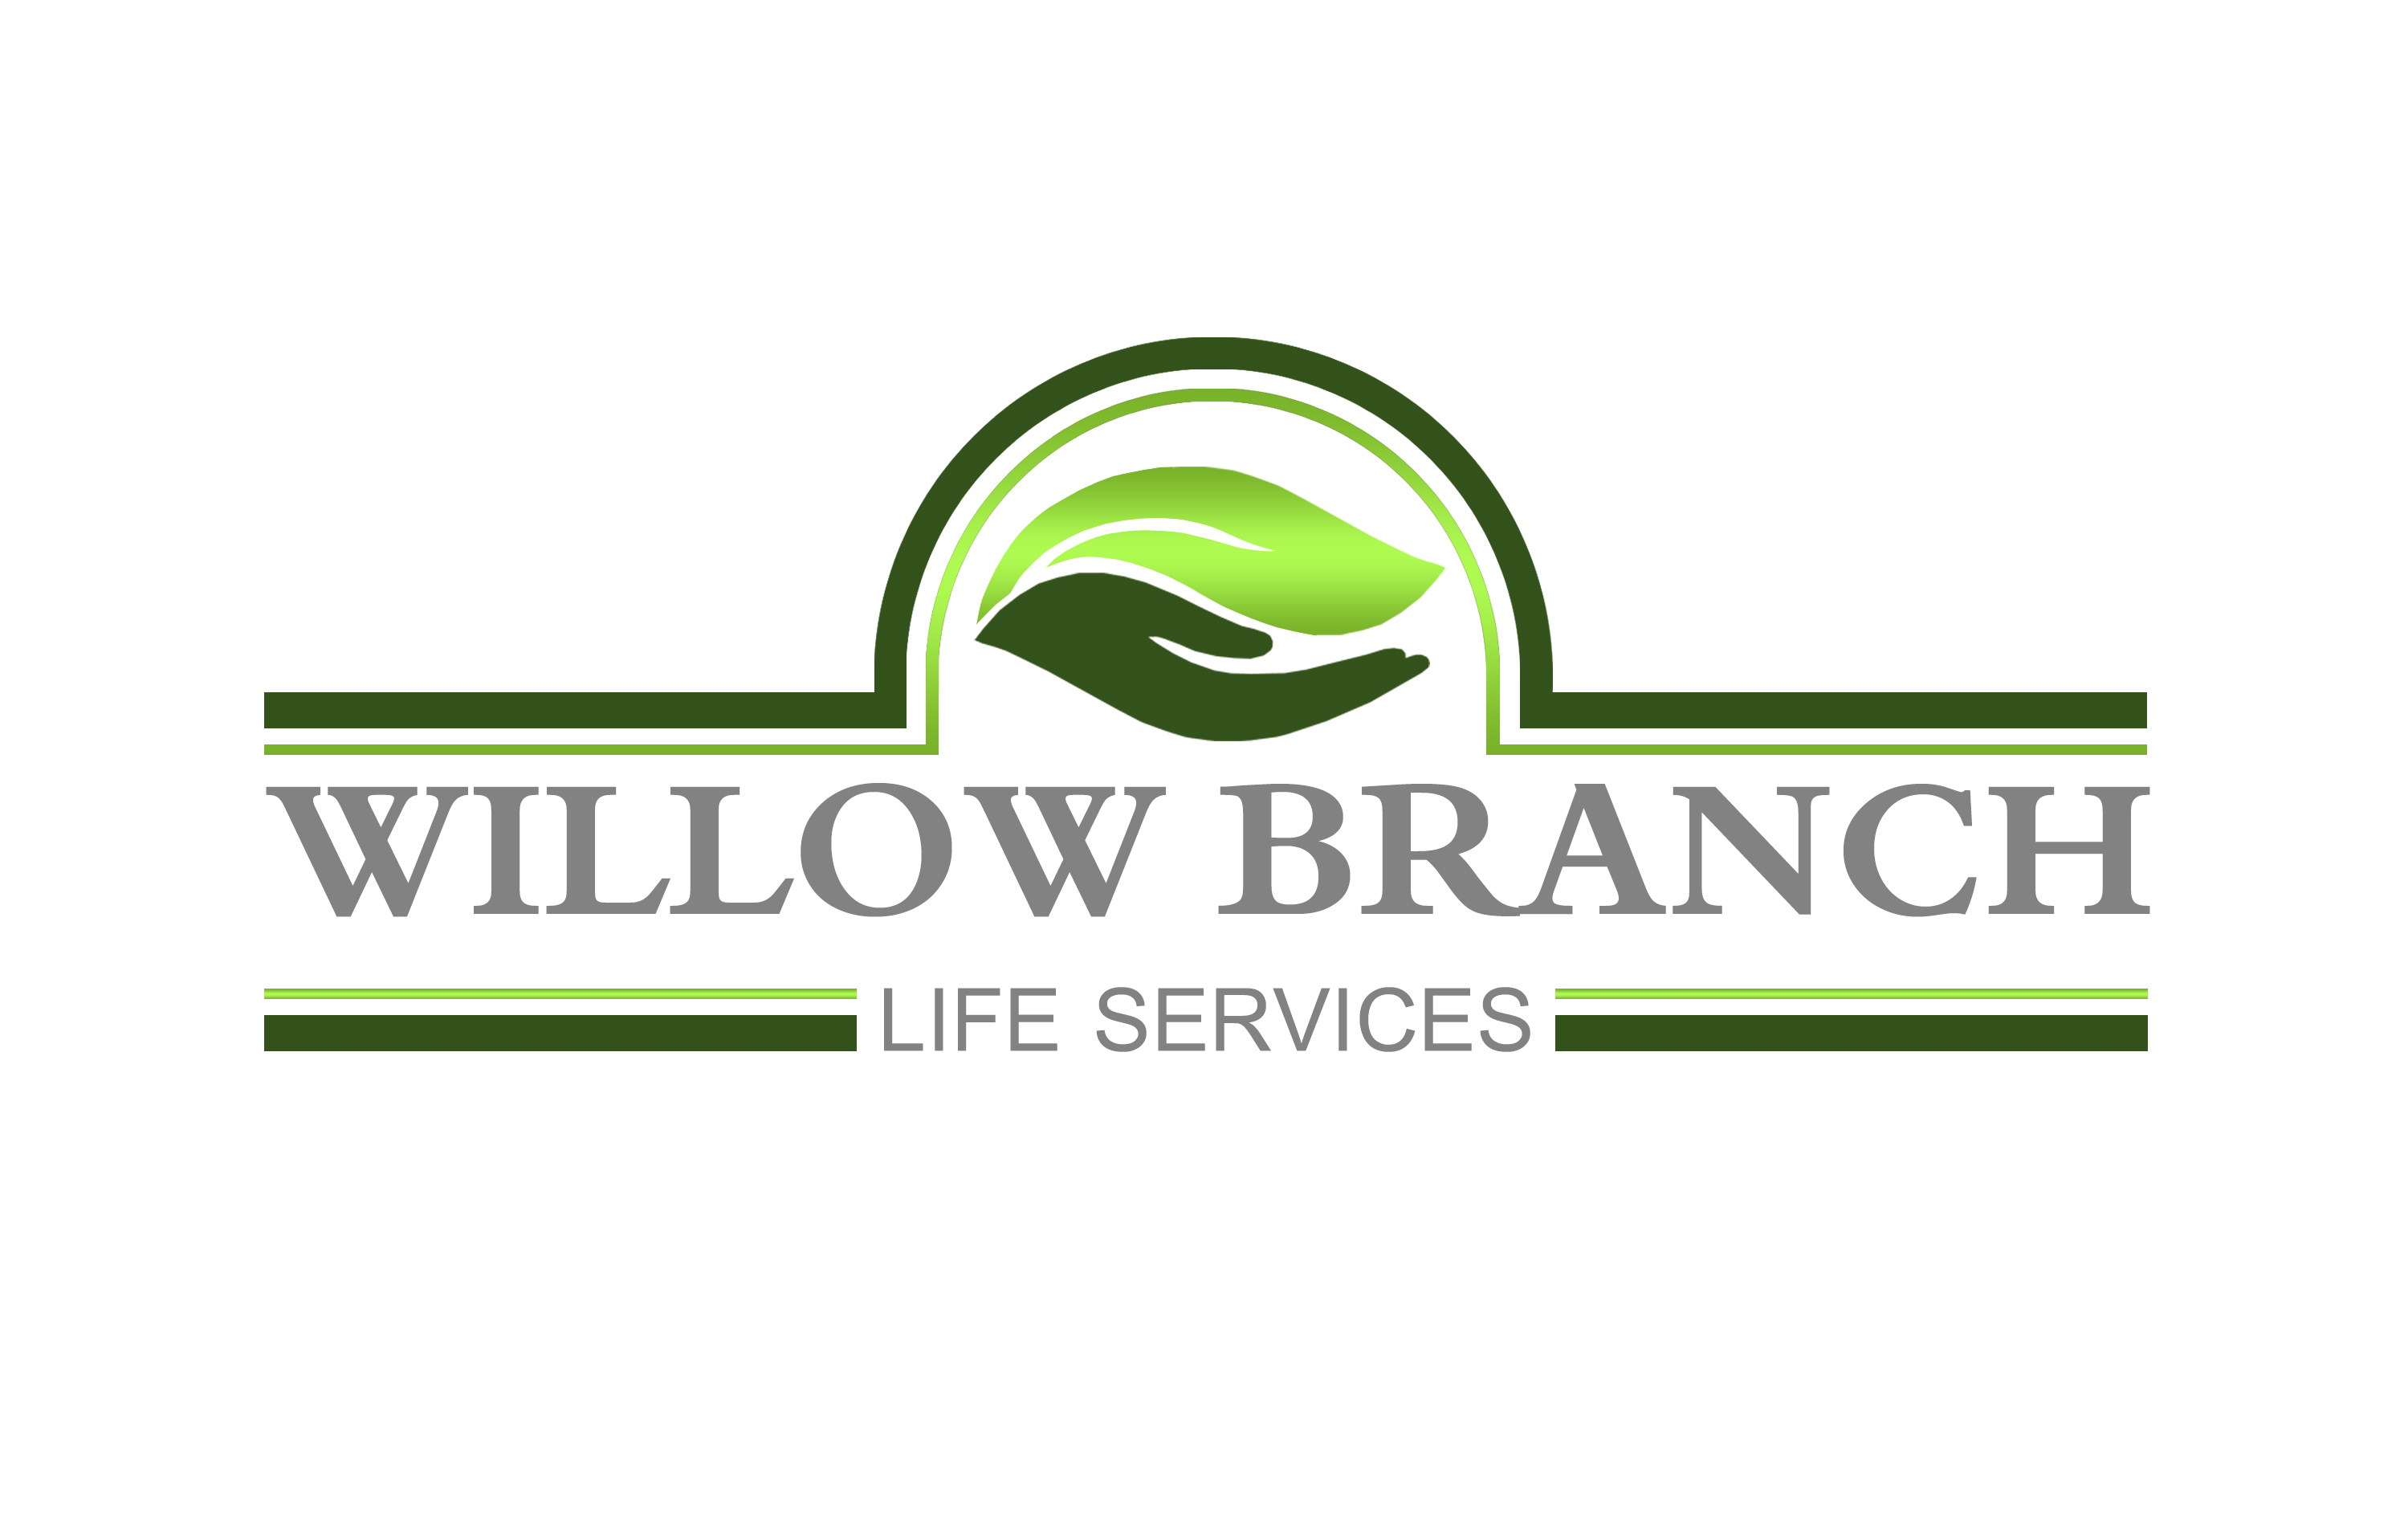 Logo Design by JSDESIGNGROUP - Entry No. 355 in the Logo Design Contest Artistic Logo Design for Willow Branch Life Service.